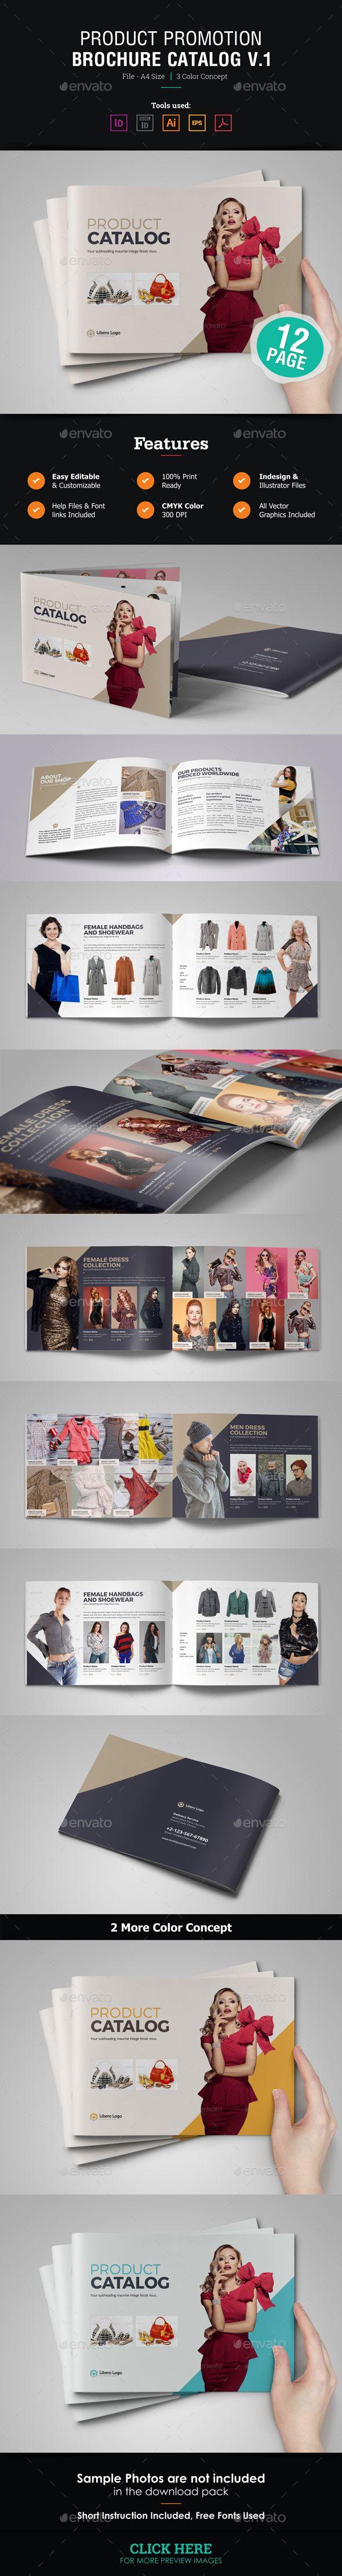 Product Promotion Brochure Catalog Template Vector EPS, InDesign INDD, AI Illustrator #design